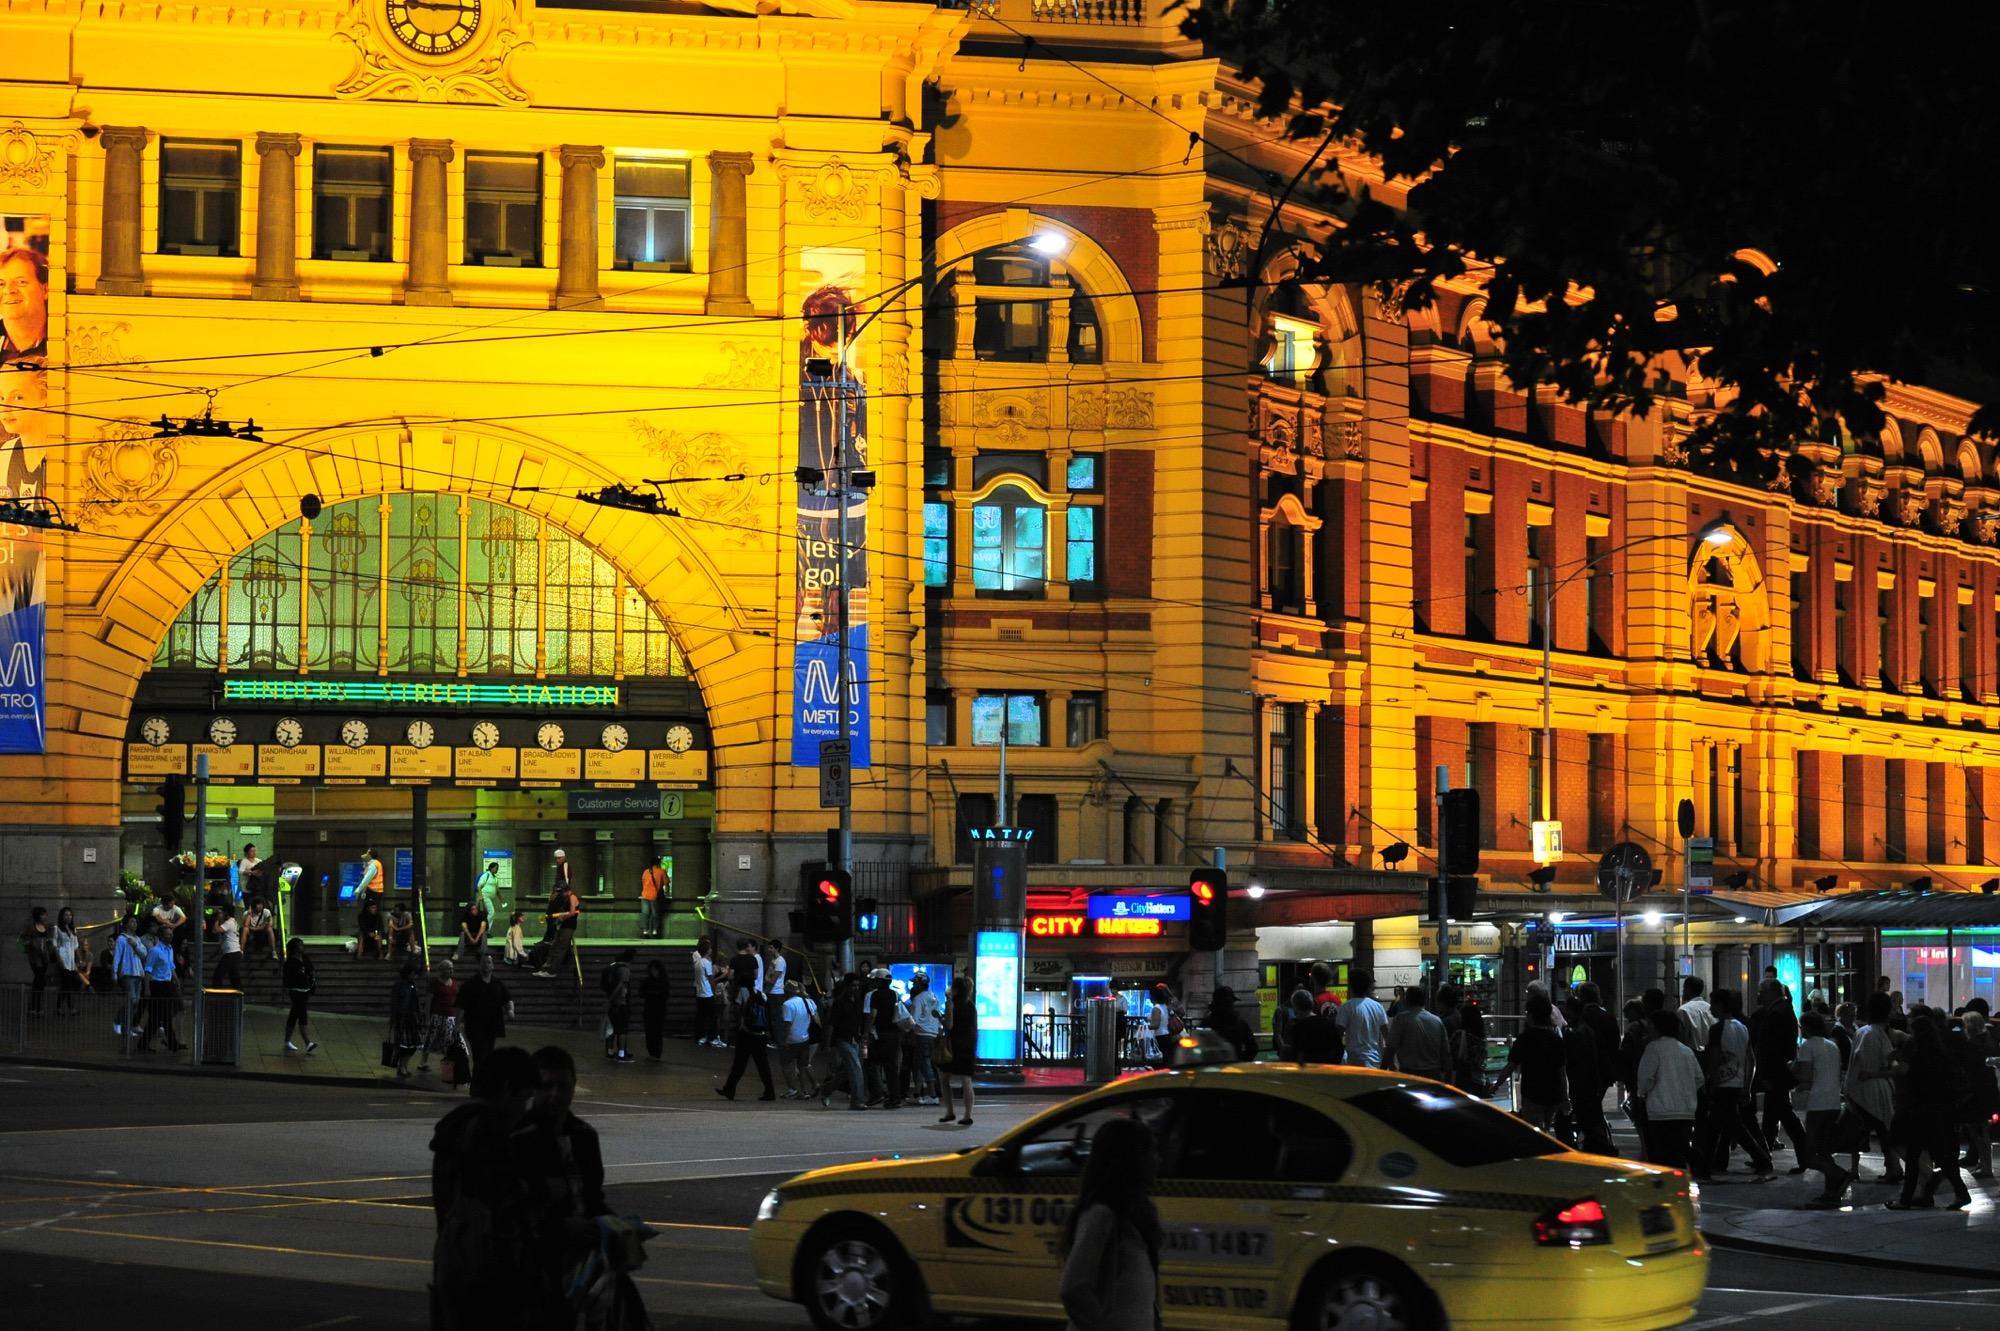 Melbourne stuff - 1 of 223 (61).jpg